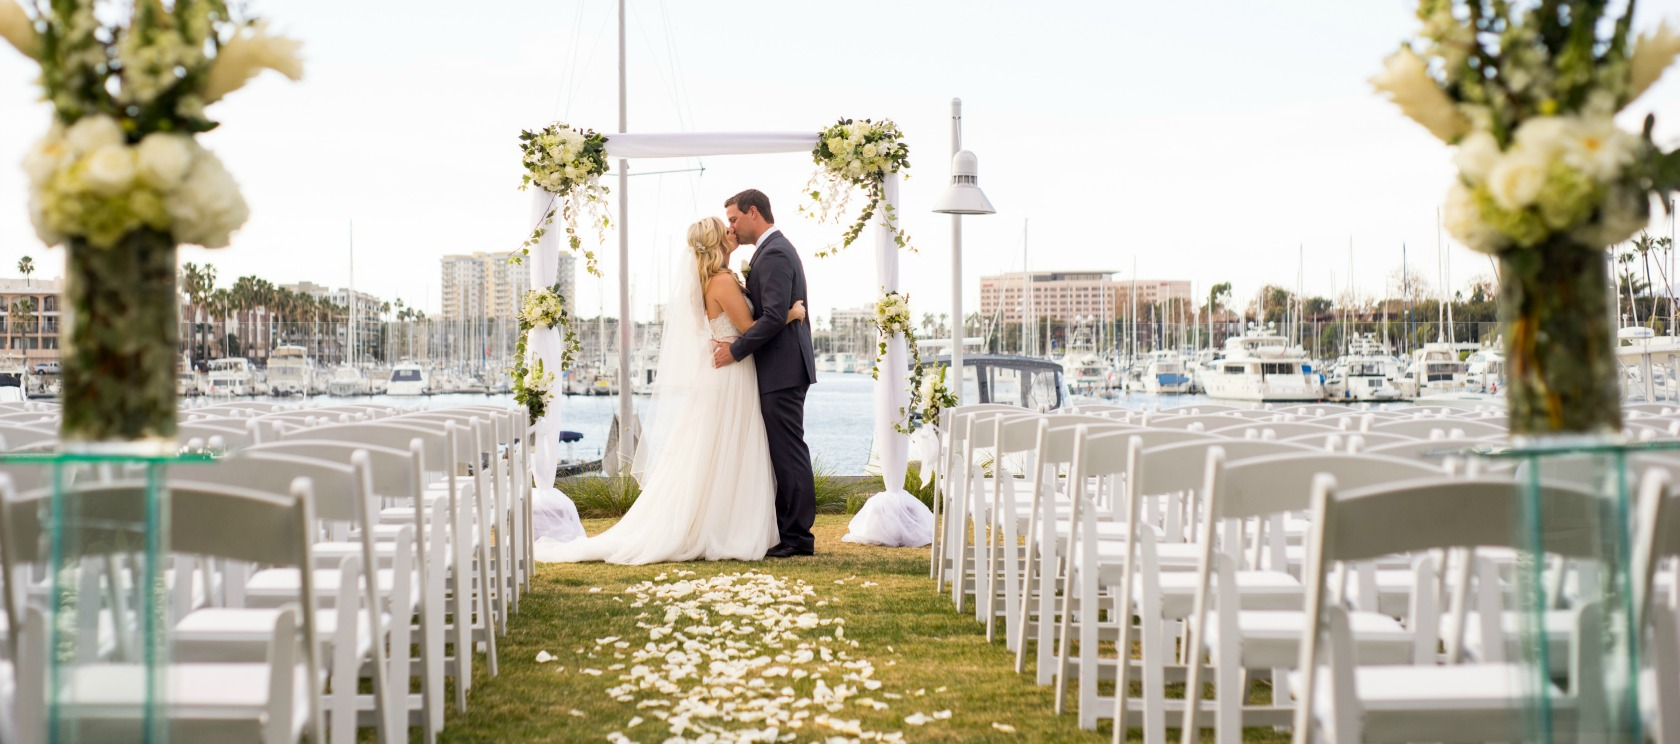 Wedding @ Marina del Rey Hotel